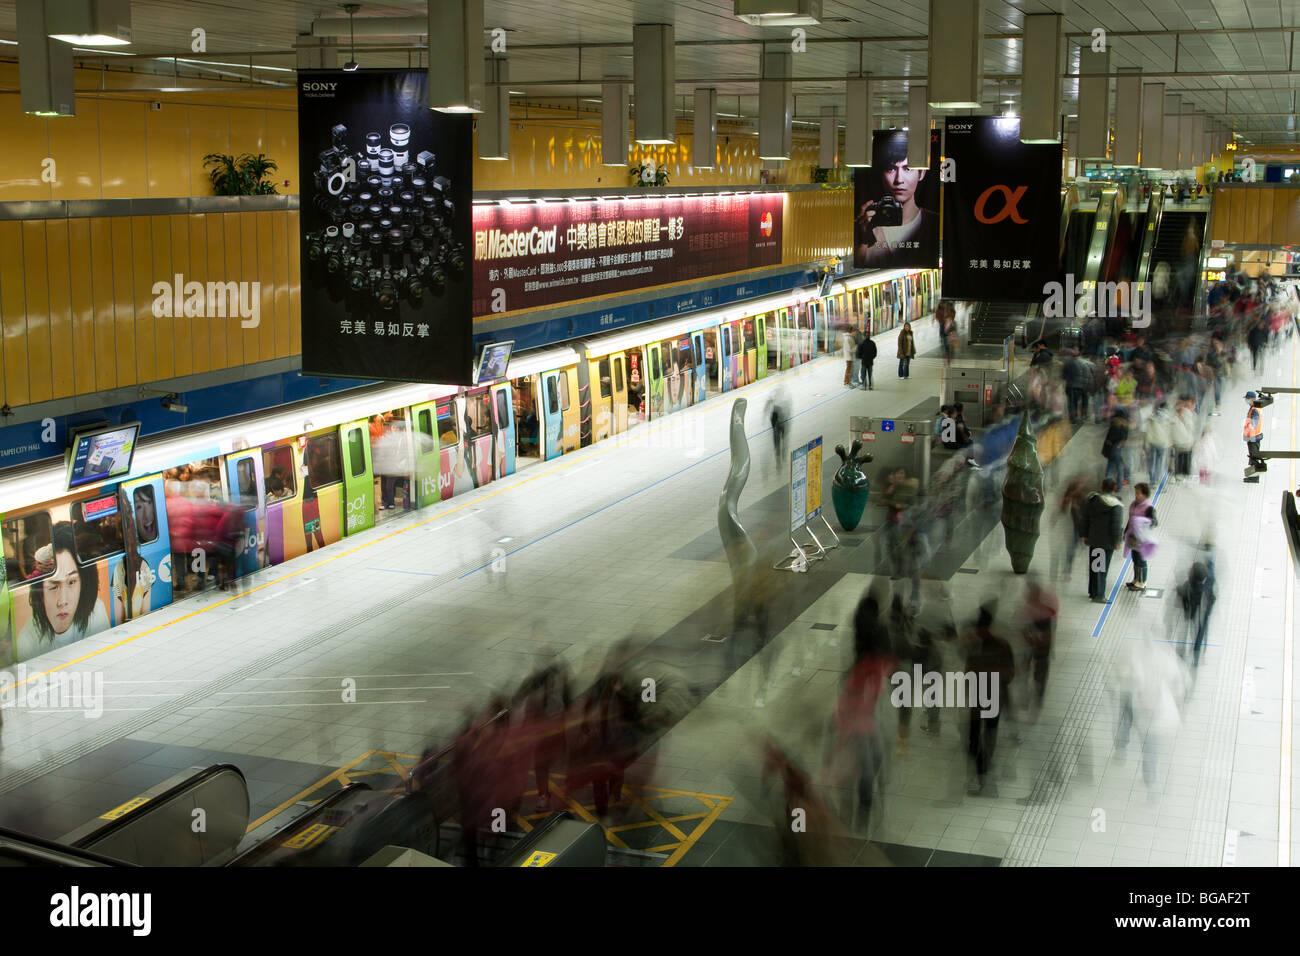 People wait, walk underground on the platform of Taipei City Hall Metro Station in Taipei, Taiwan. Blurring moving Stock Photo